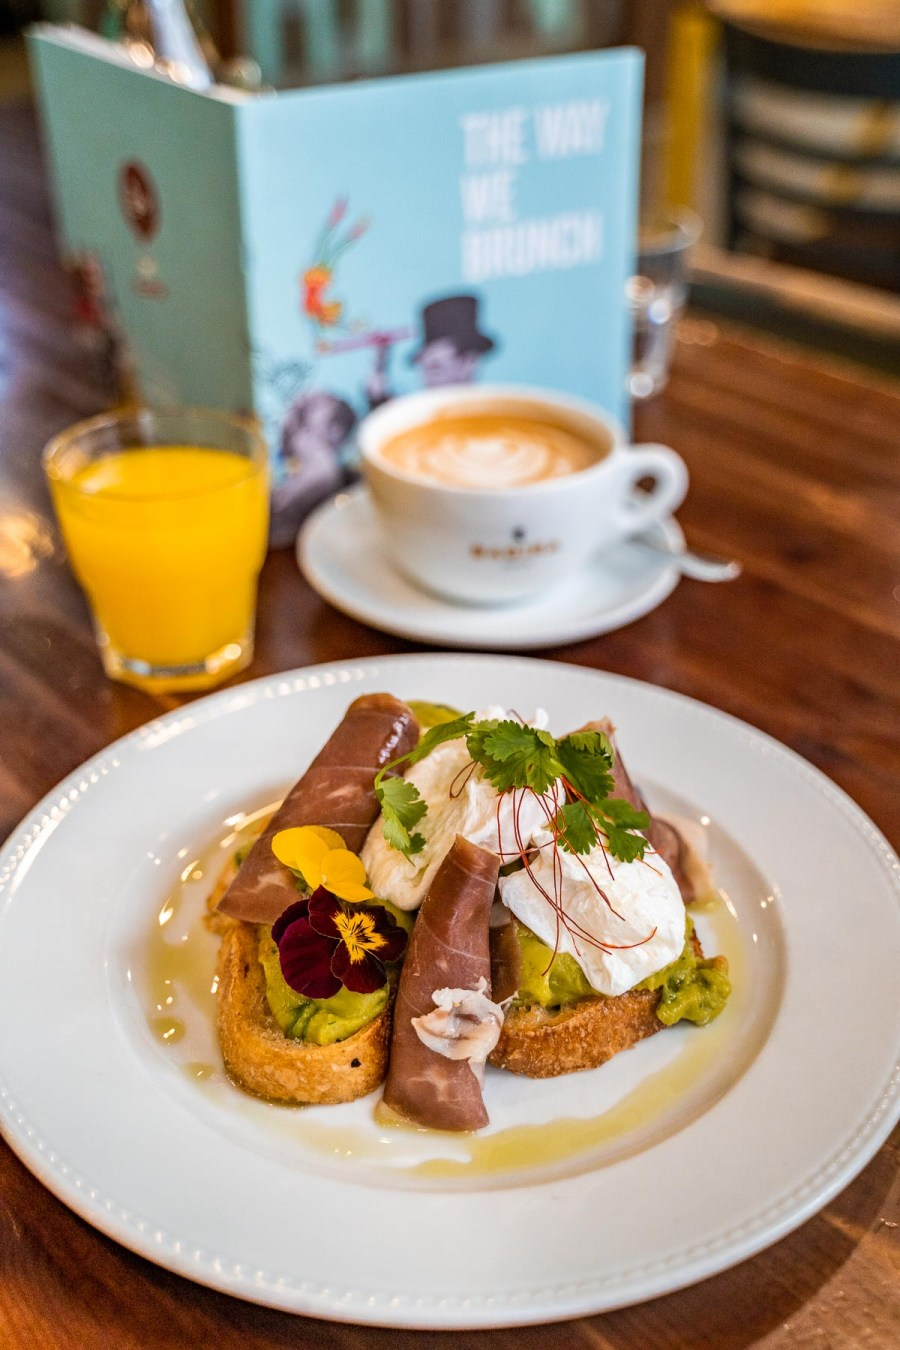 Breakfast at Cirkusz Cafe in Budapest